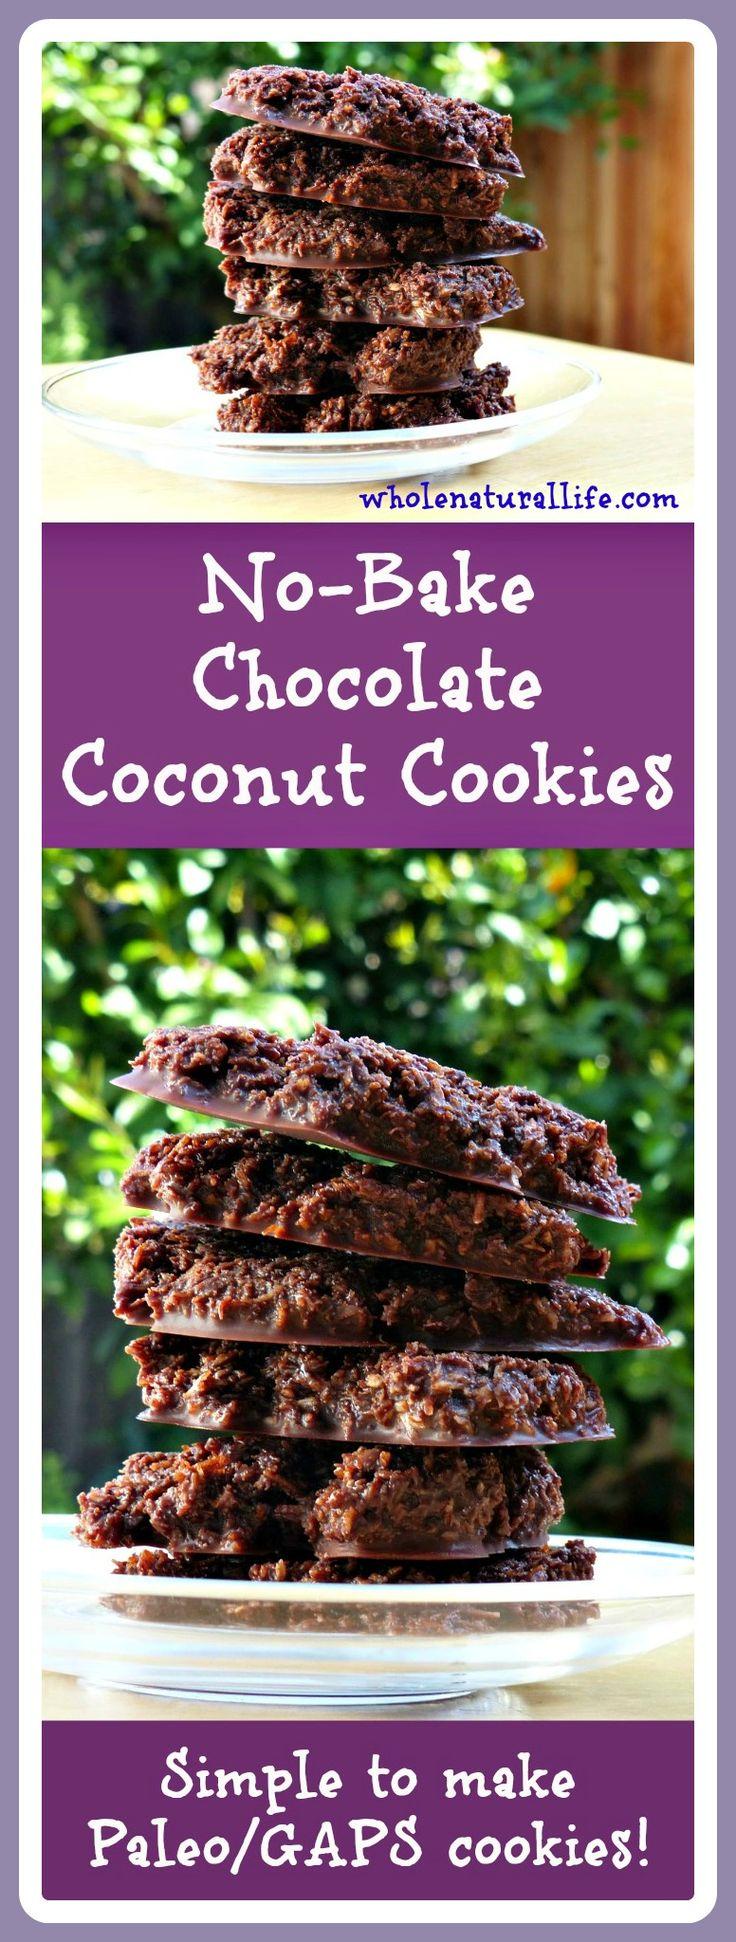 No-Bake Chocolate Coconut Cookies: Paleo/GAPS-friendly!